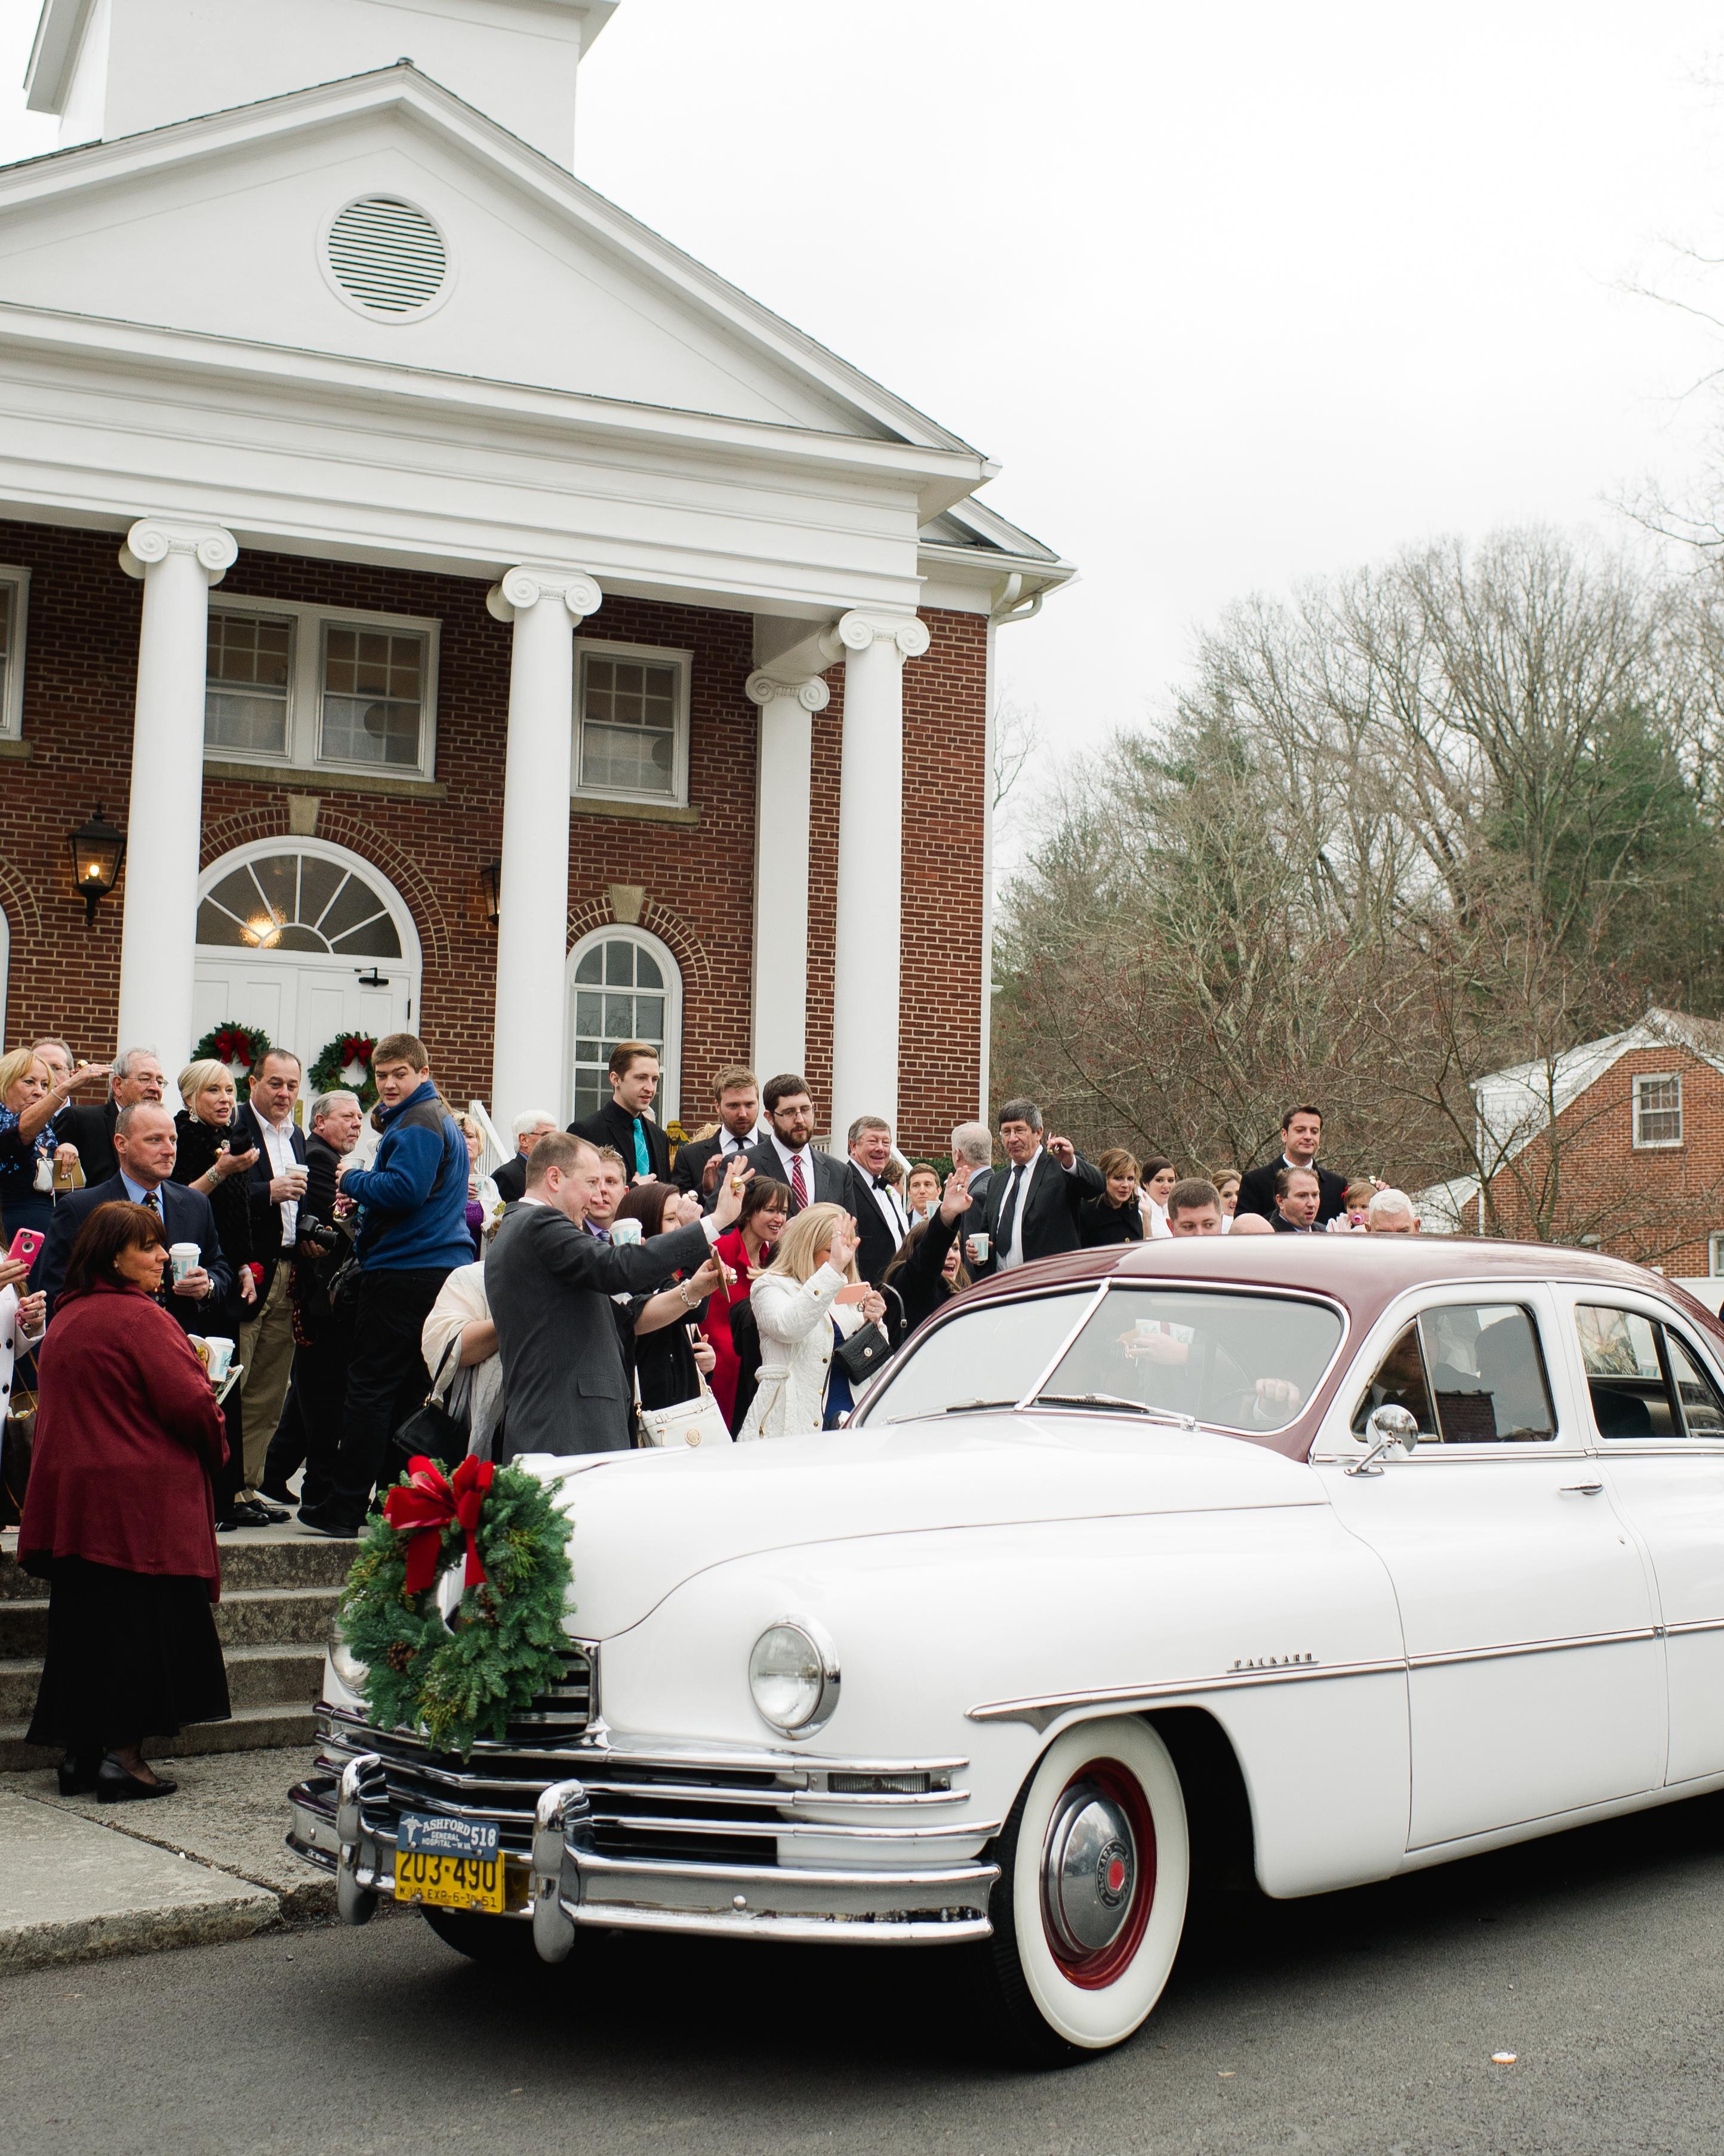 paige-michael-wedding-car-0779-s112431-1215.jpg